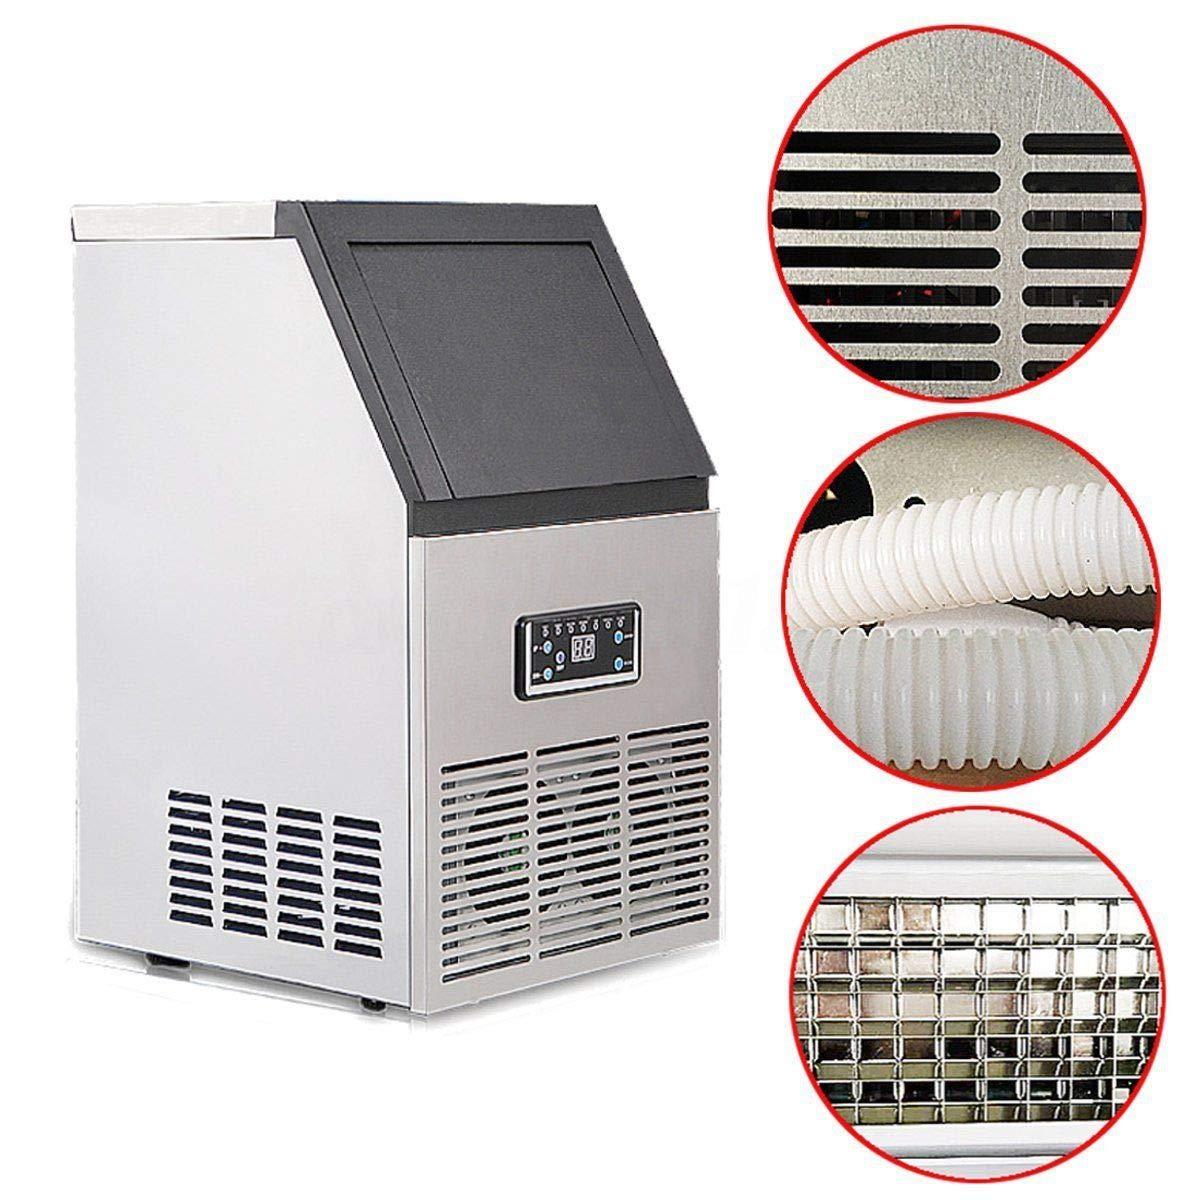 FidgetFidget 50kg Auto Commercial Ice Maker Cube Machine Stainless Steel Bar 110Lbs 230W 110V